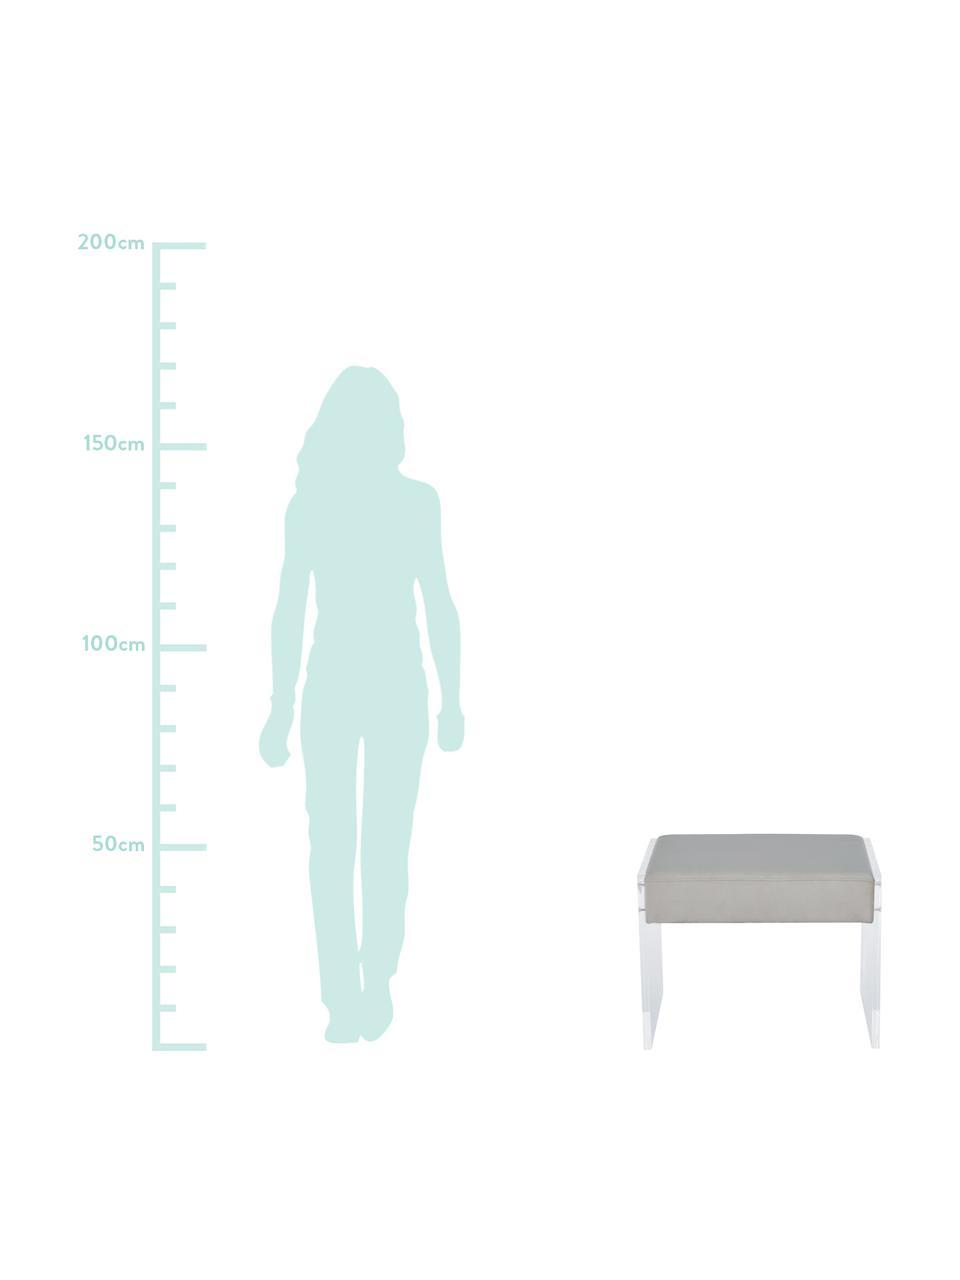 Samt-Hocker Ayden mit Gestell aus Acrylglas, Bezug: Samt (Polyester) 25.000 S, Gestell: Massives Pappelholz, Sper, Beine: Acrylglas, Bezug: HellgrauGestell: Transparent, 61 x 45 cm